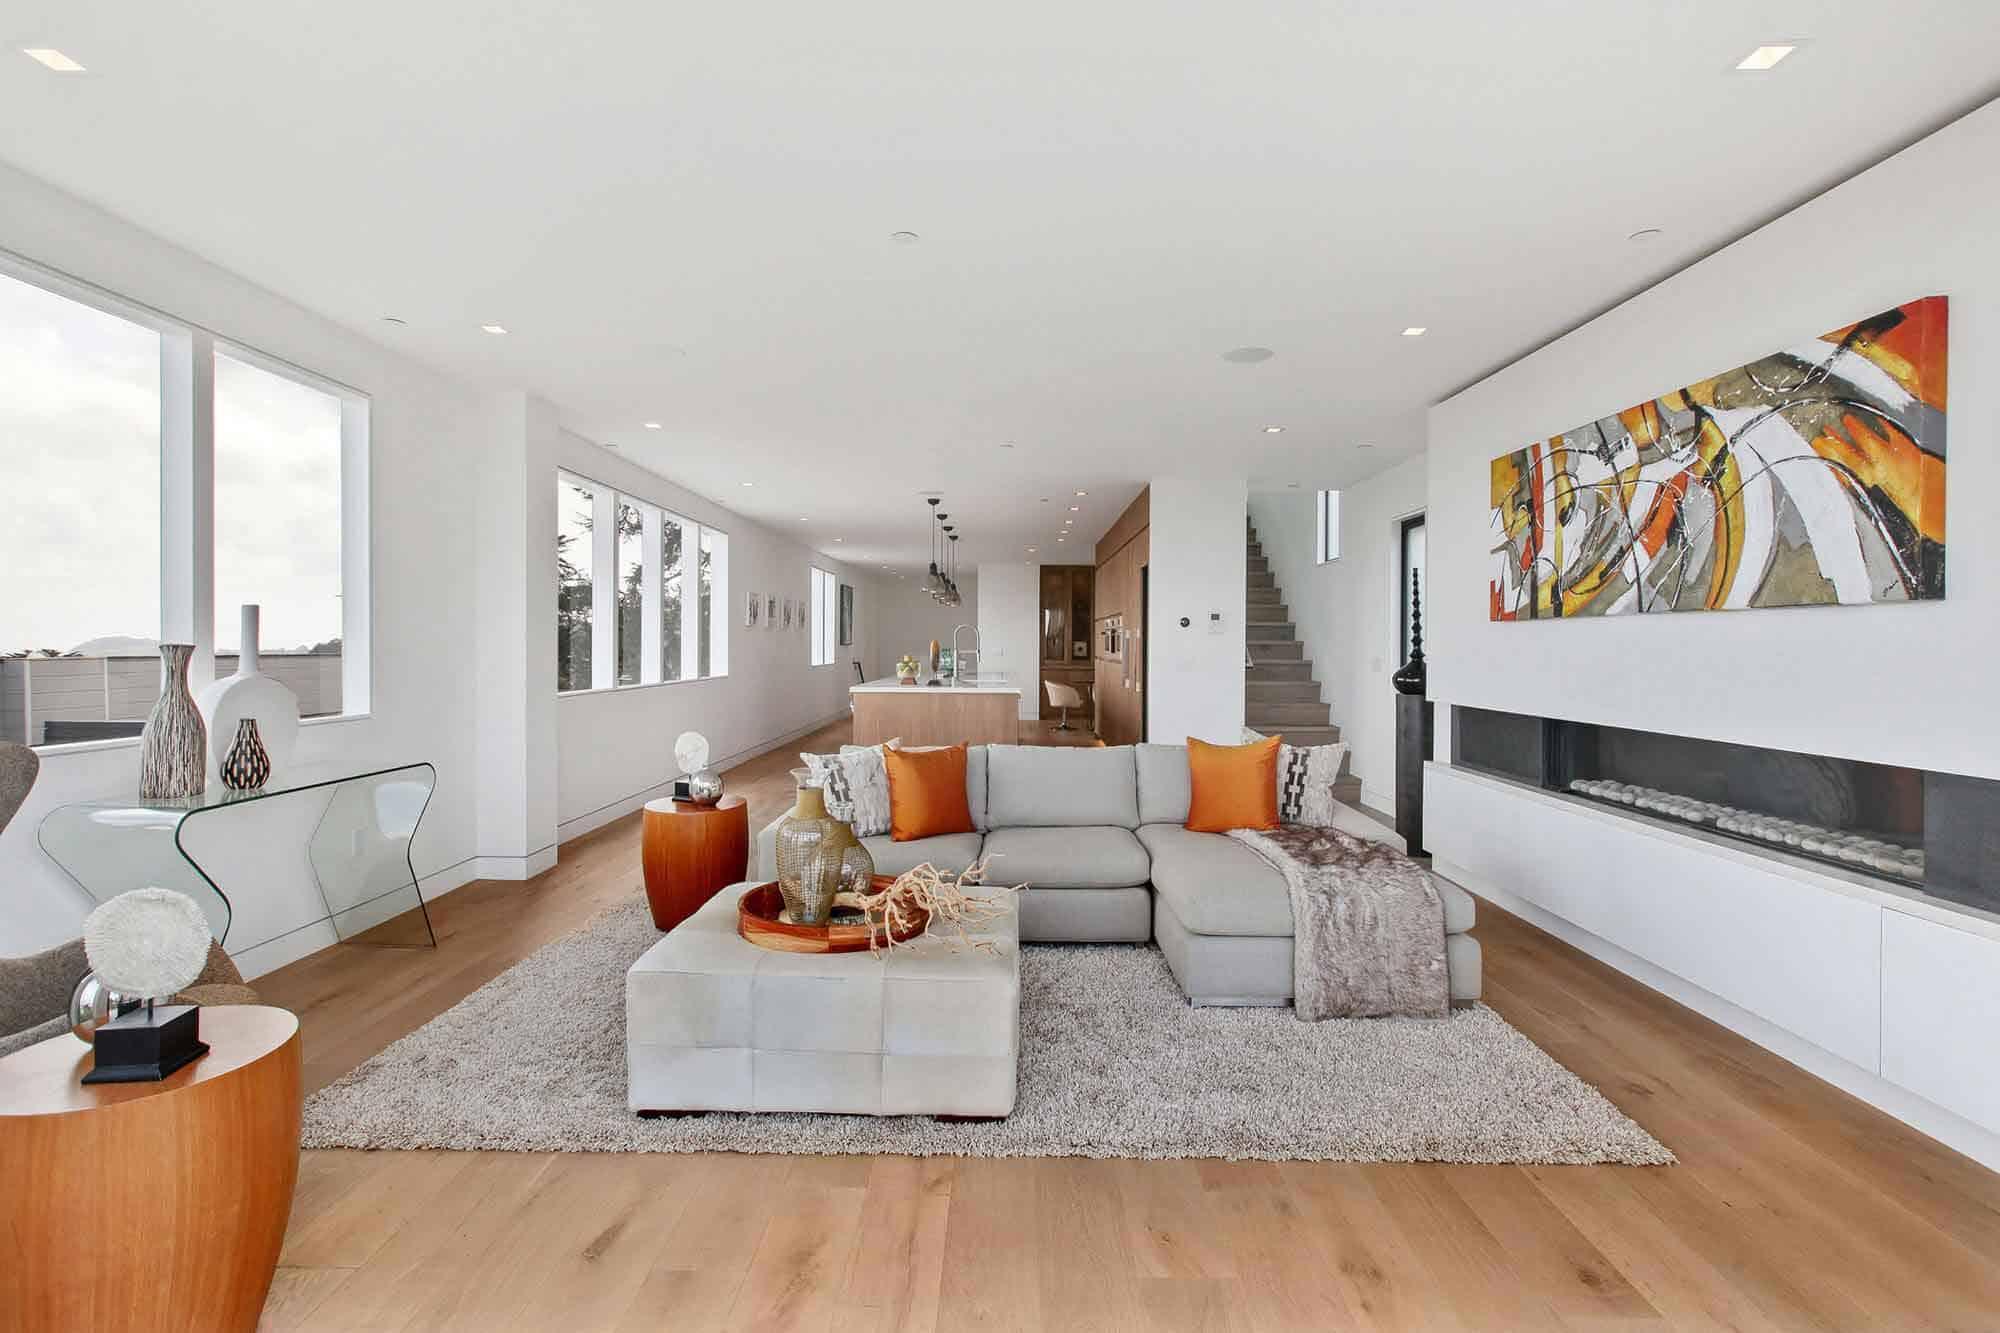 Favreau Design Creates a Vibrant Modern Home in San Francisco, California